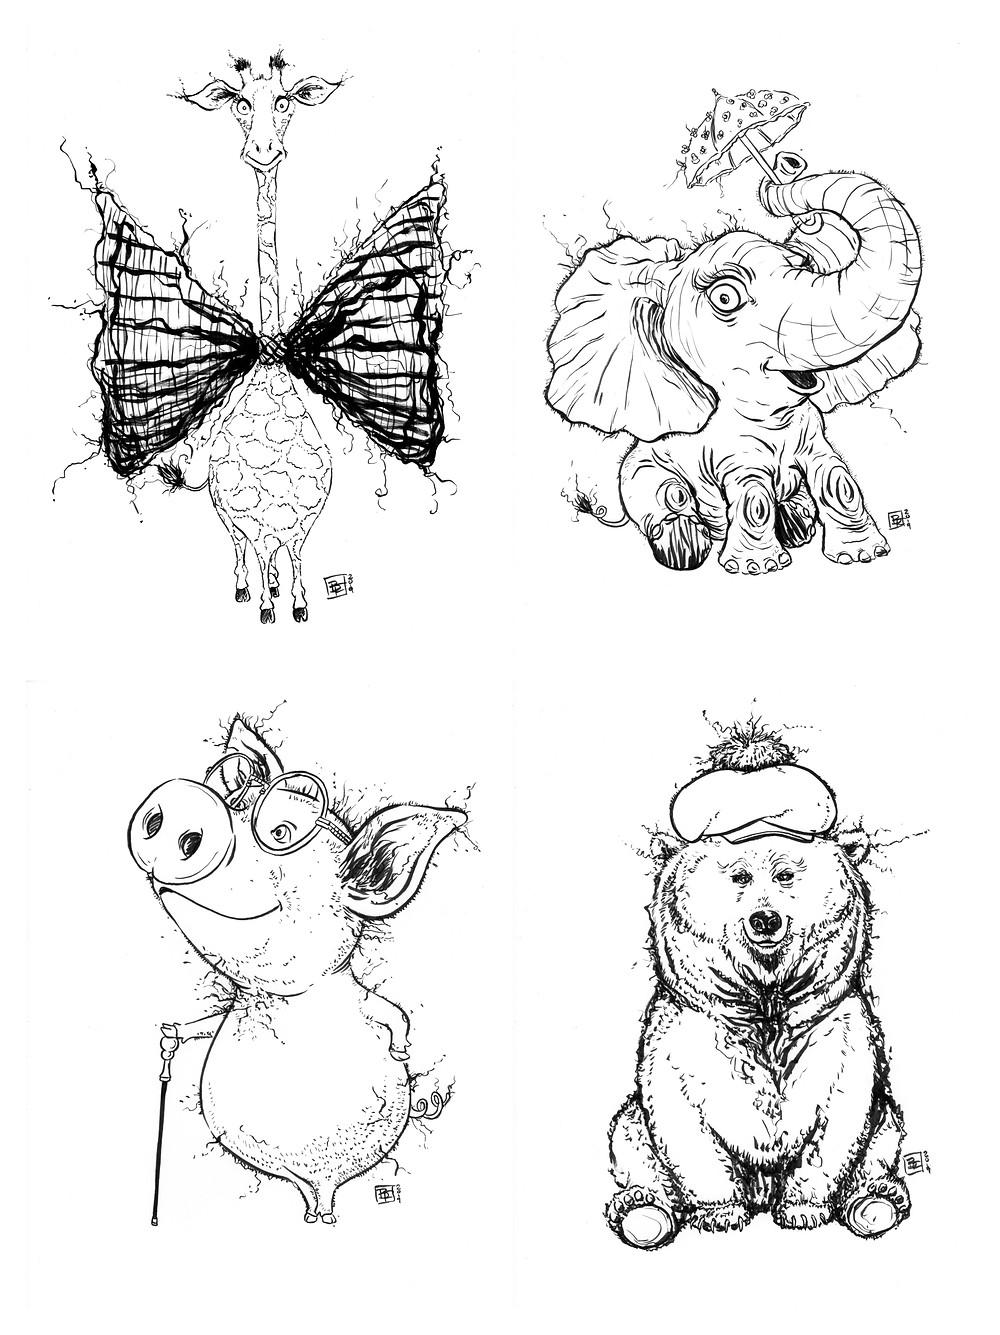 Cute fuzzy happy animal drawings (Giraffe, Elephant, Piggy, Bear) for Inktober - Part 2